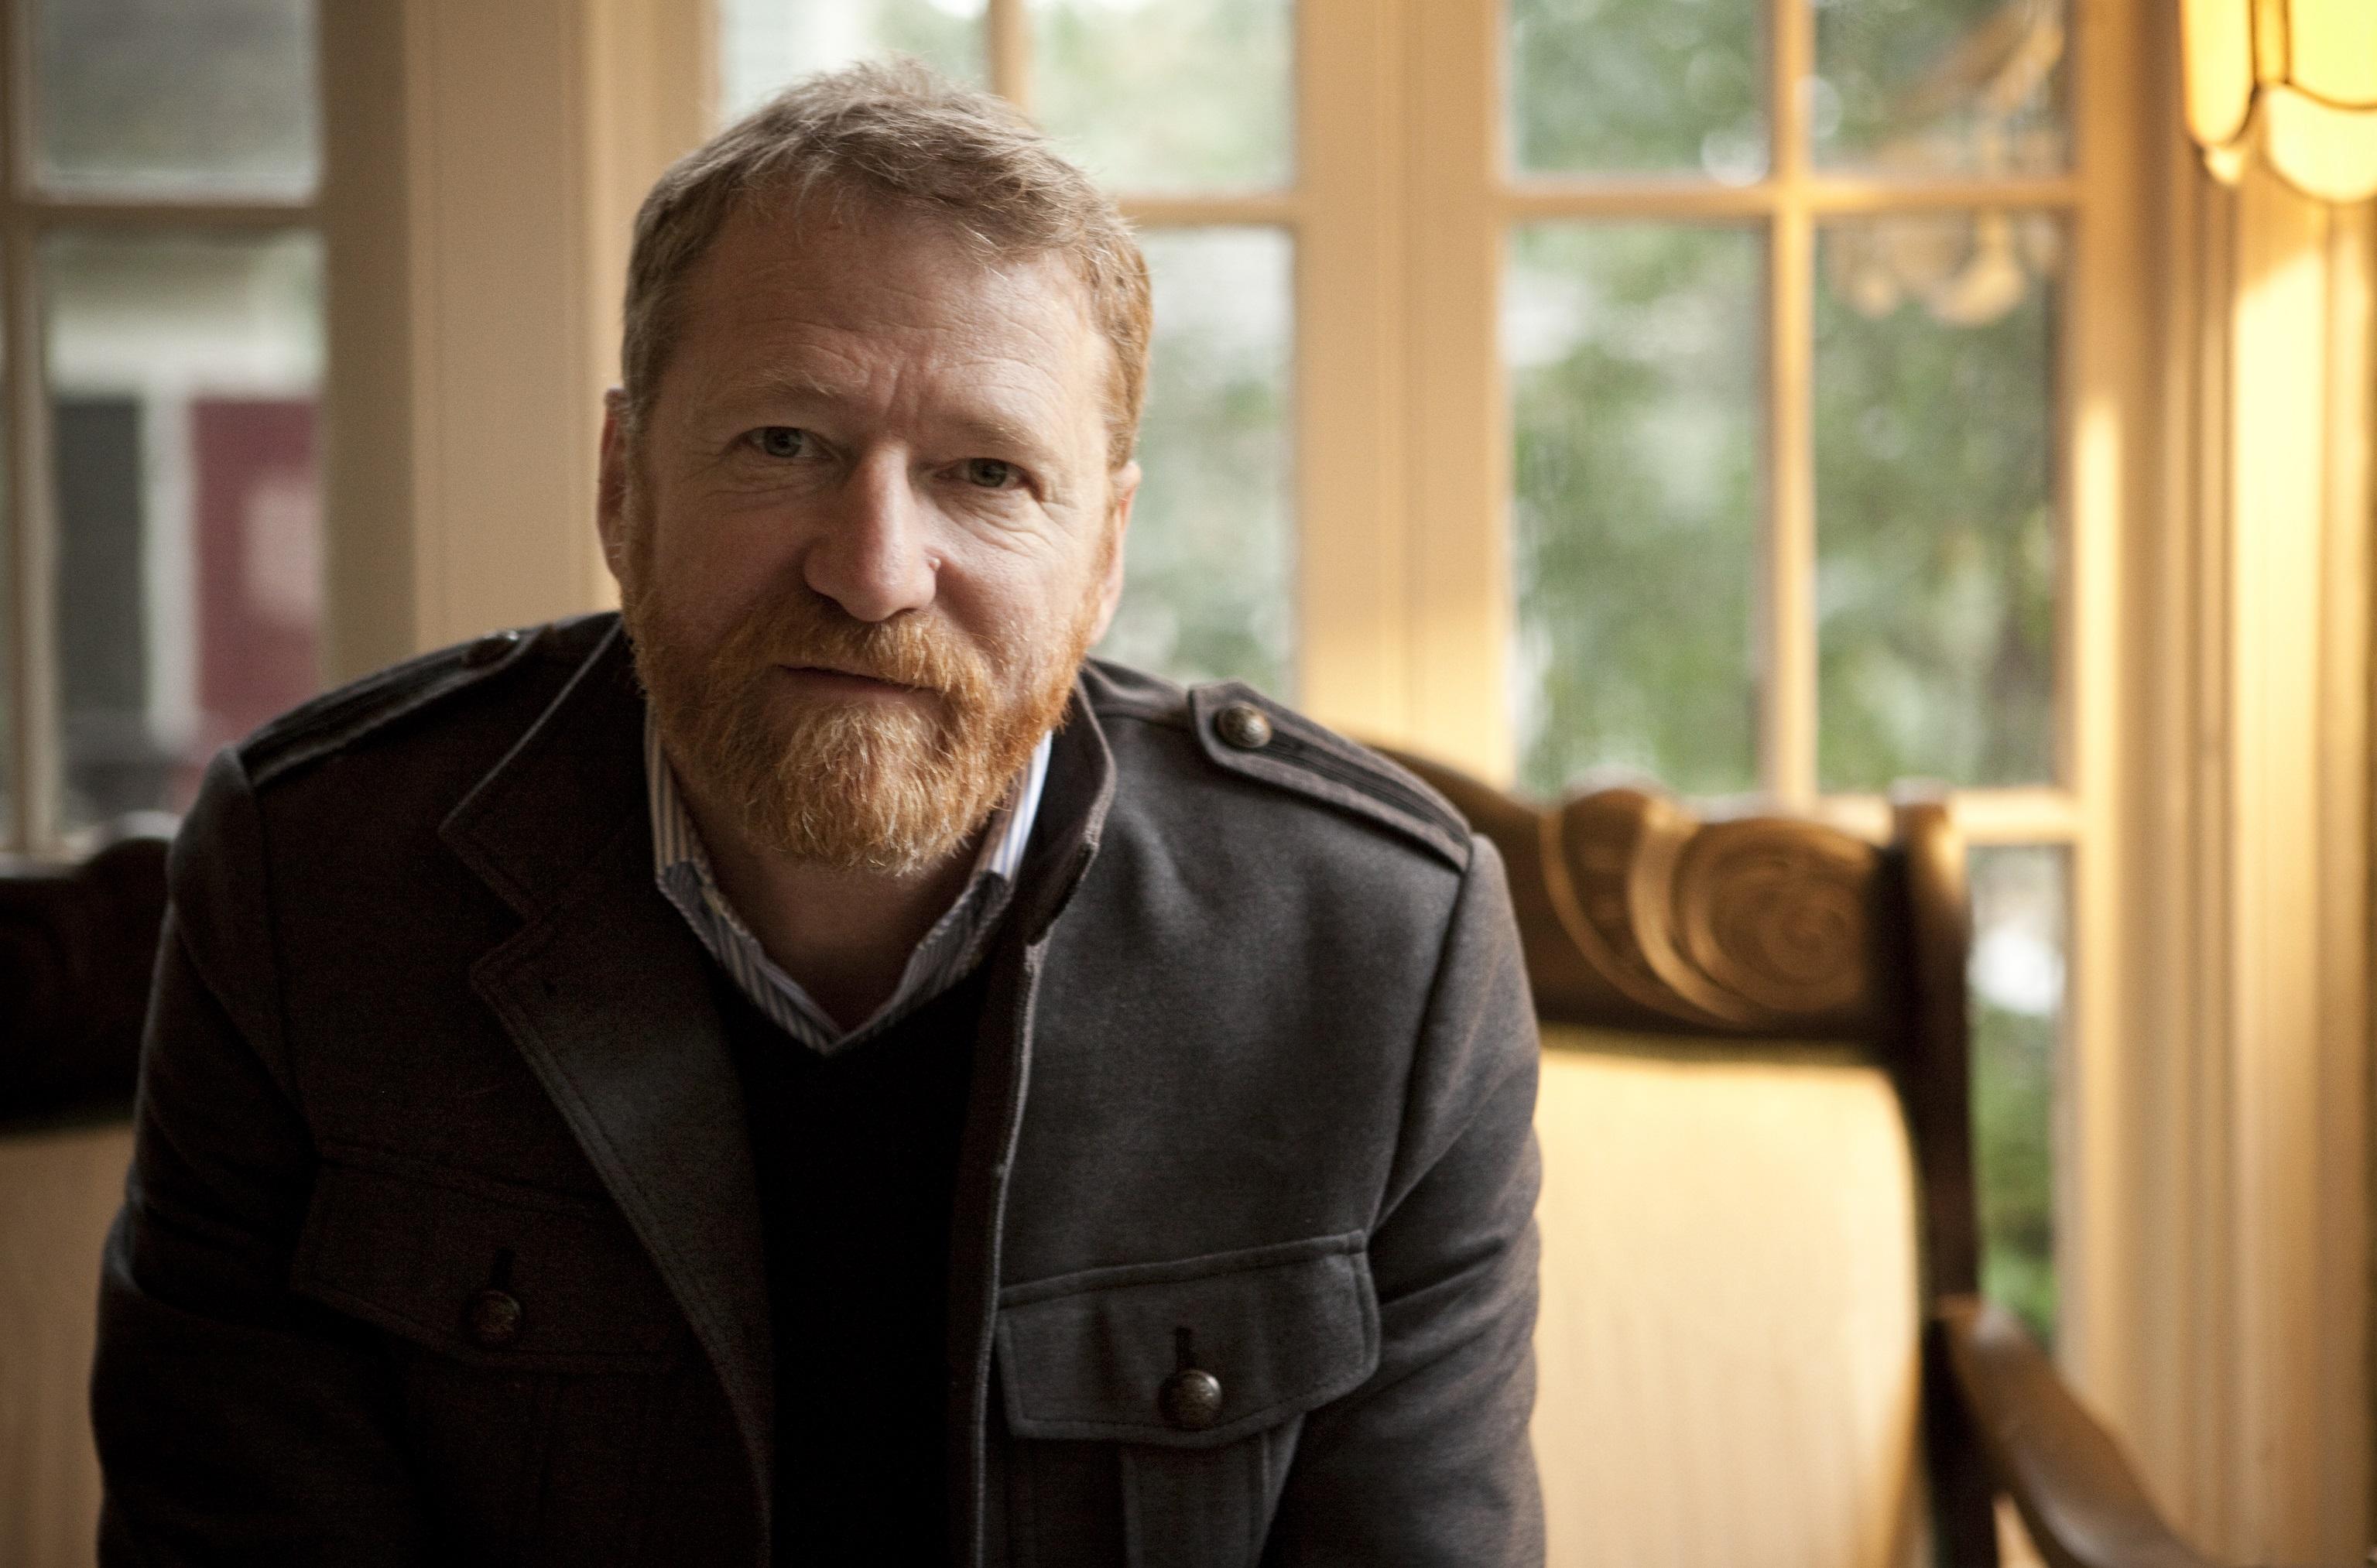 Musikeren David Lowery har rettet et massesøksmål mot Spotify.